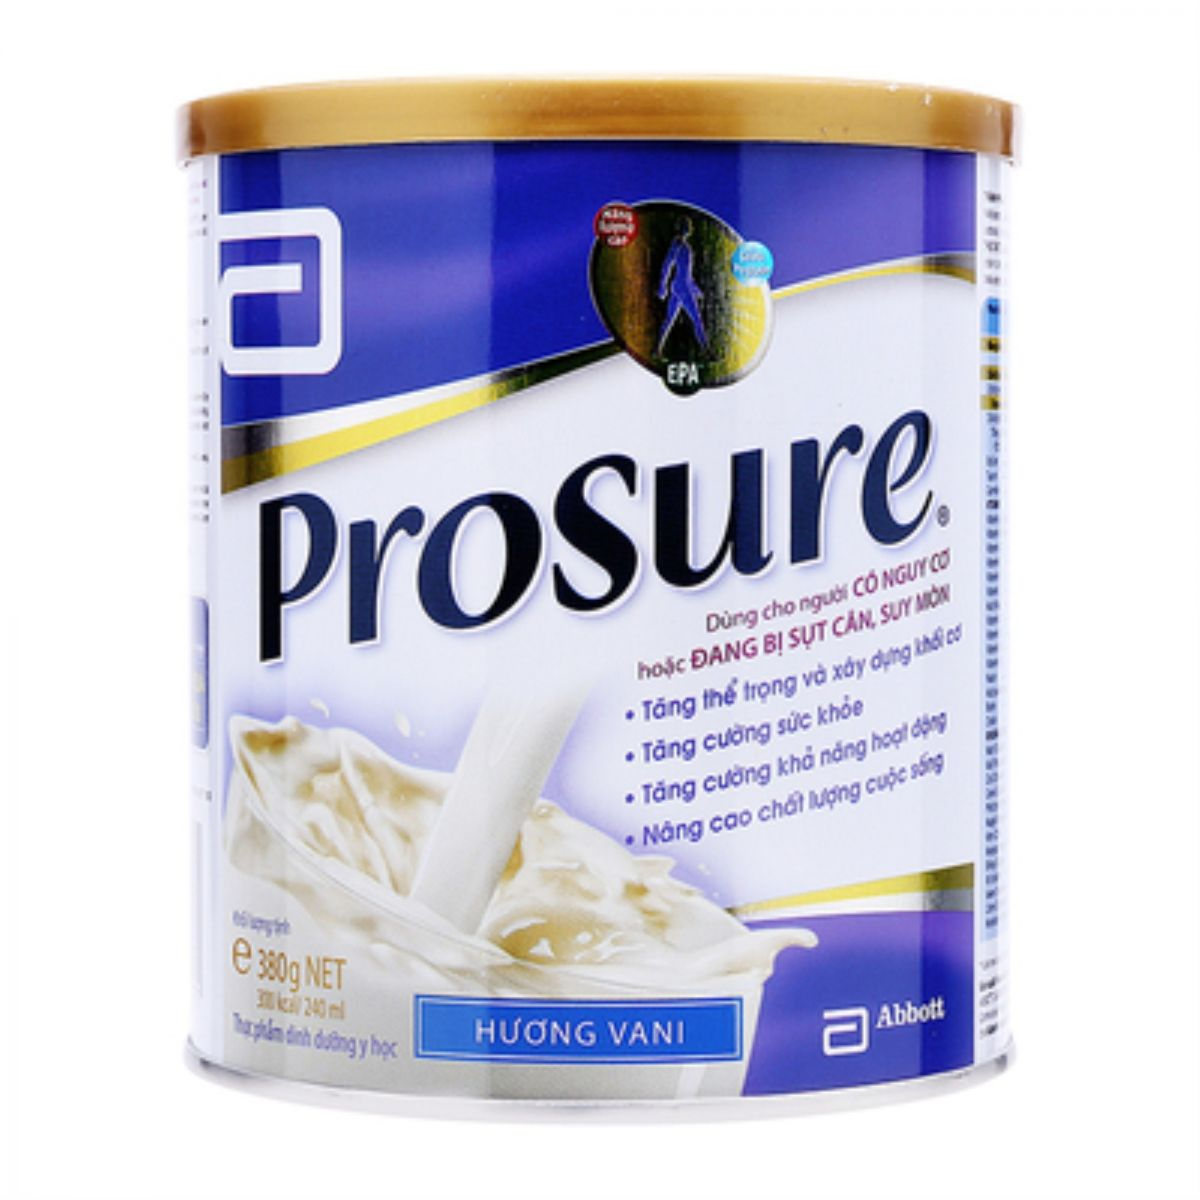 Sữa Prosure hương vani